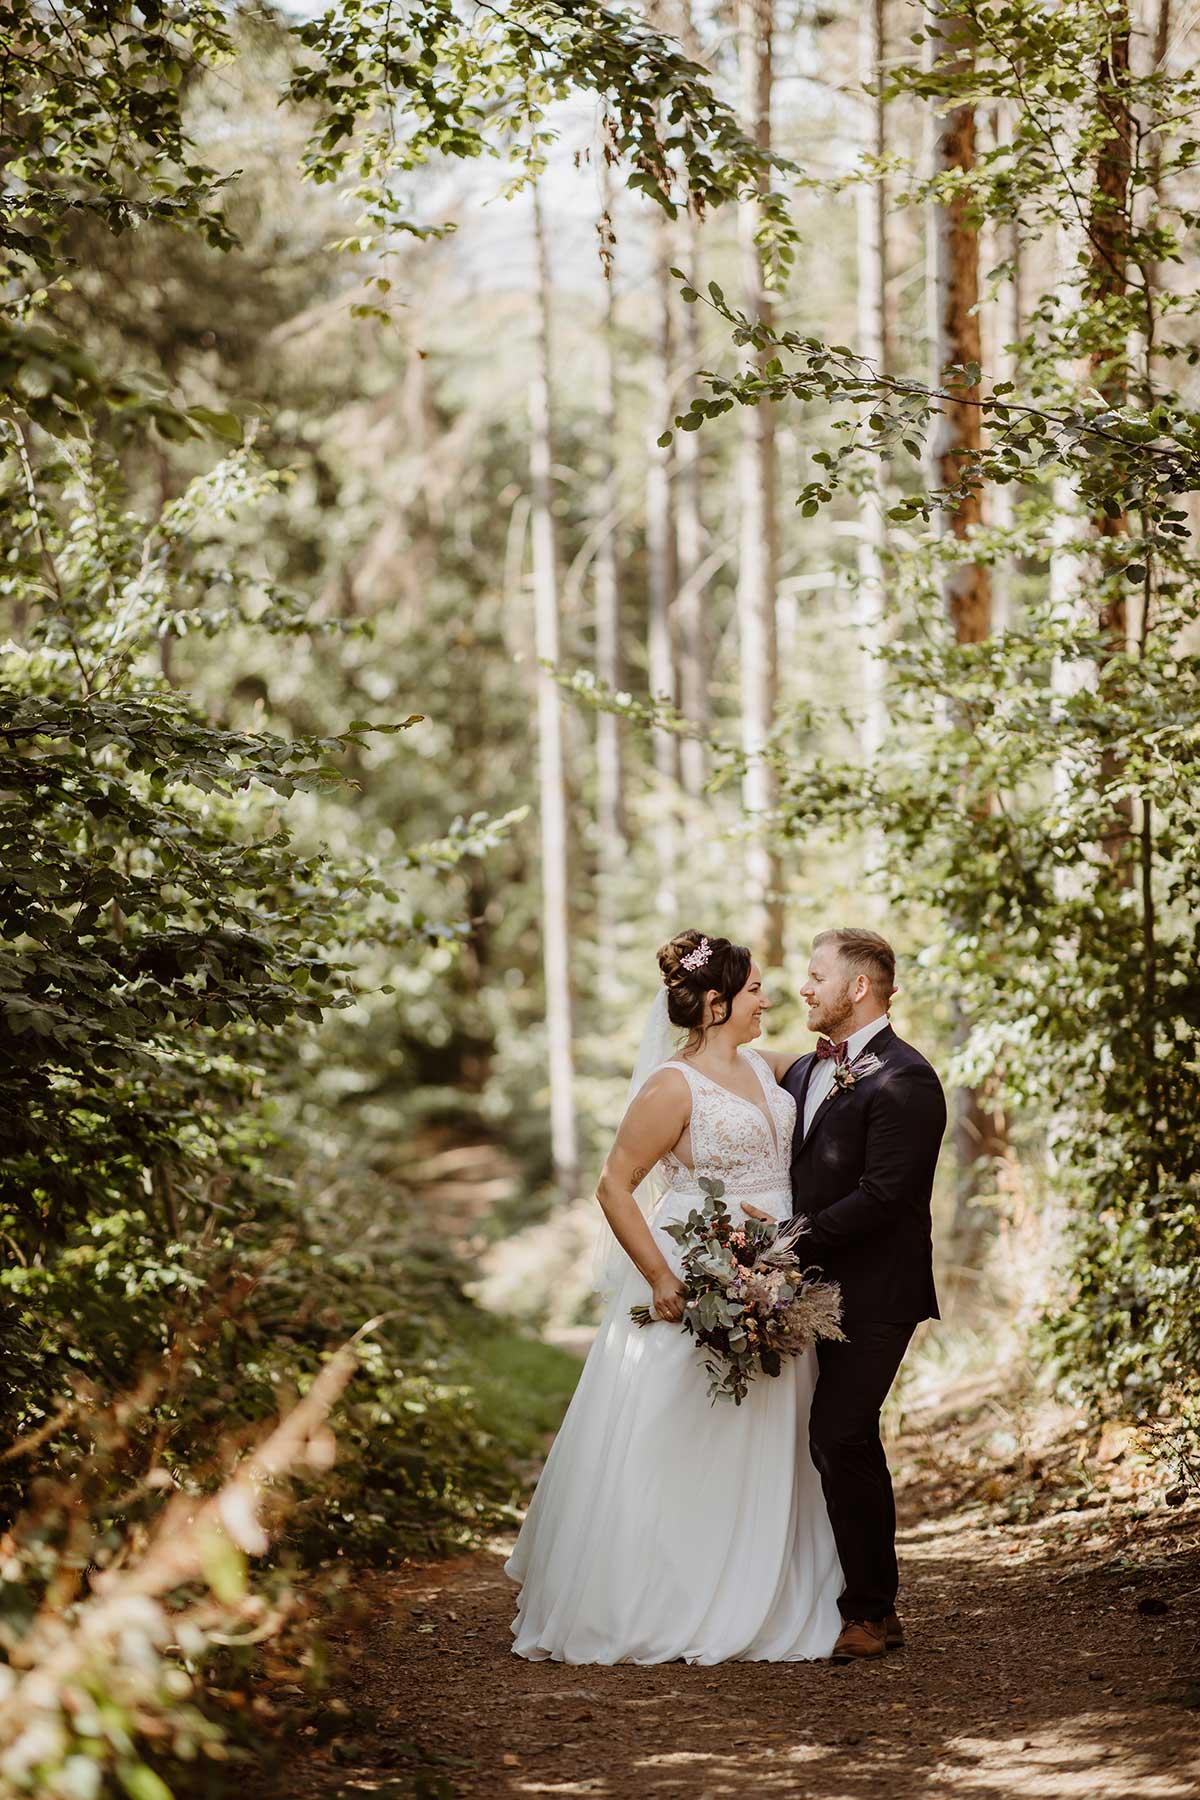 Braut und Bräutigam Fotoshooting im Wald